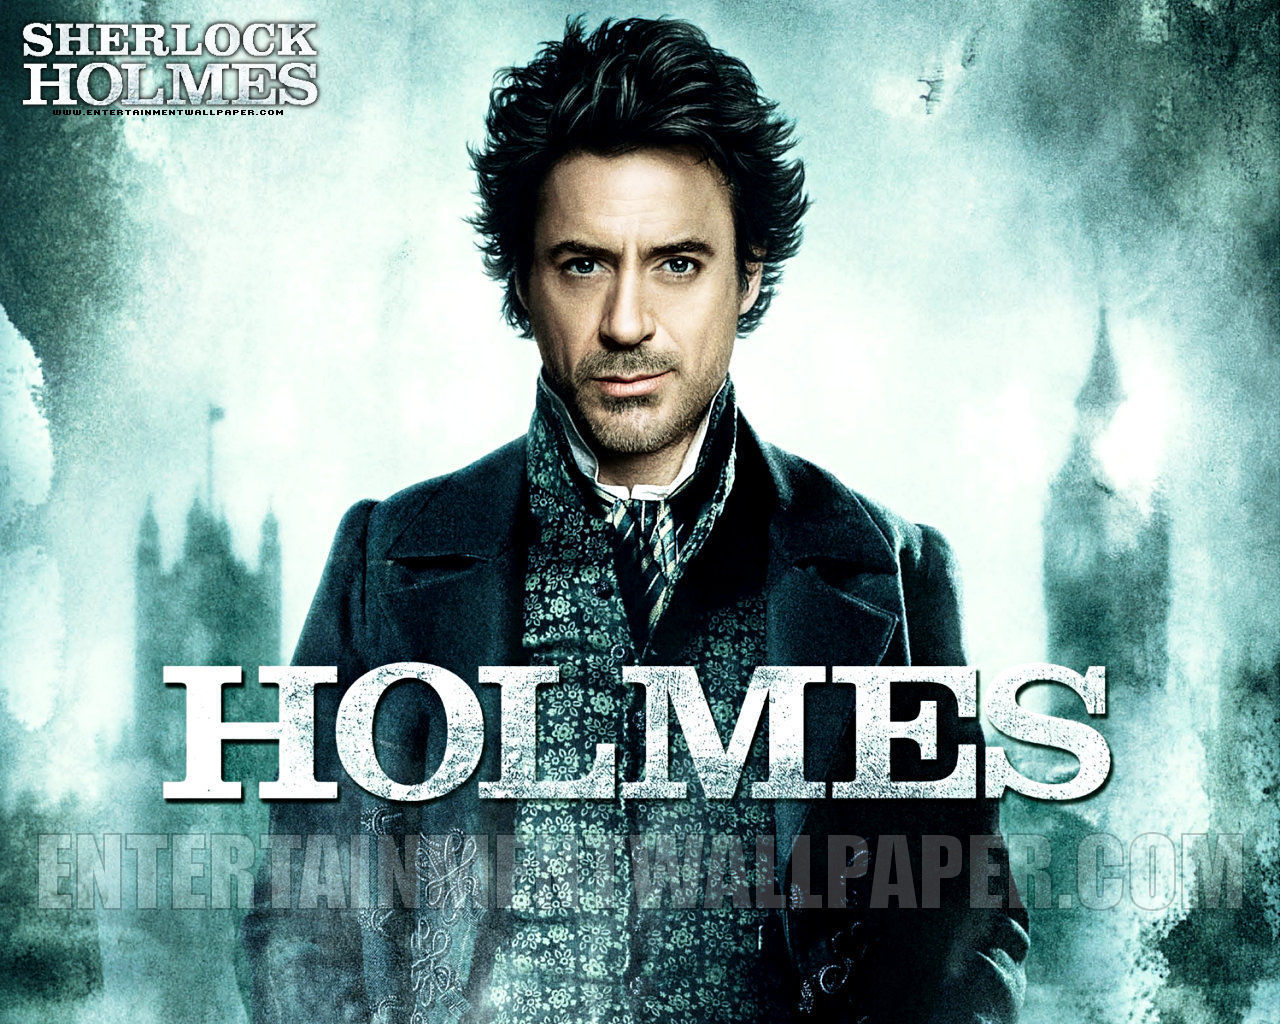 Holmes Robert Downey Jr As Sherlock Holmes Wallpaper 13119288